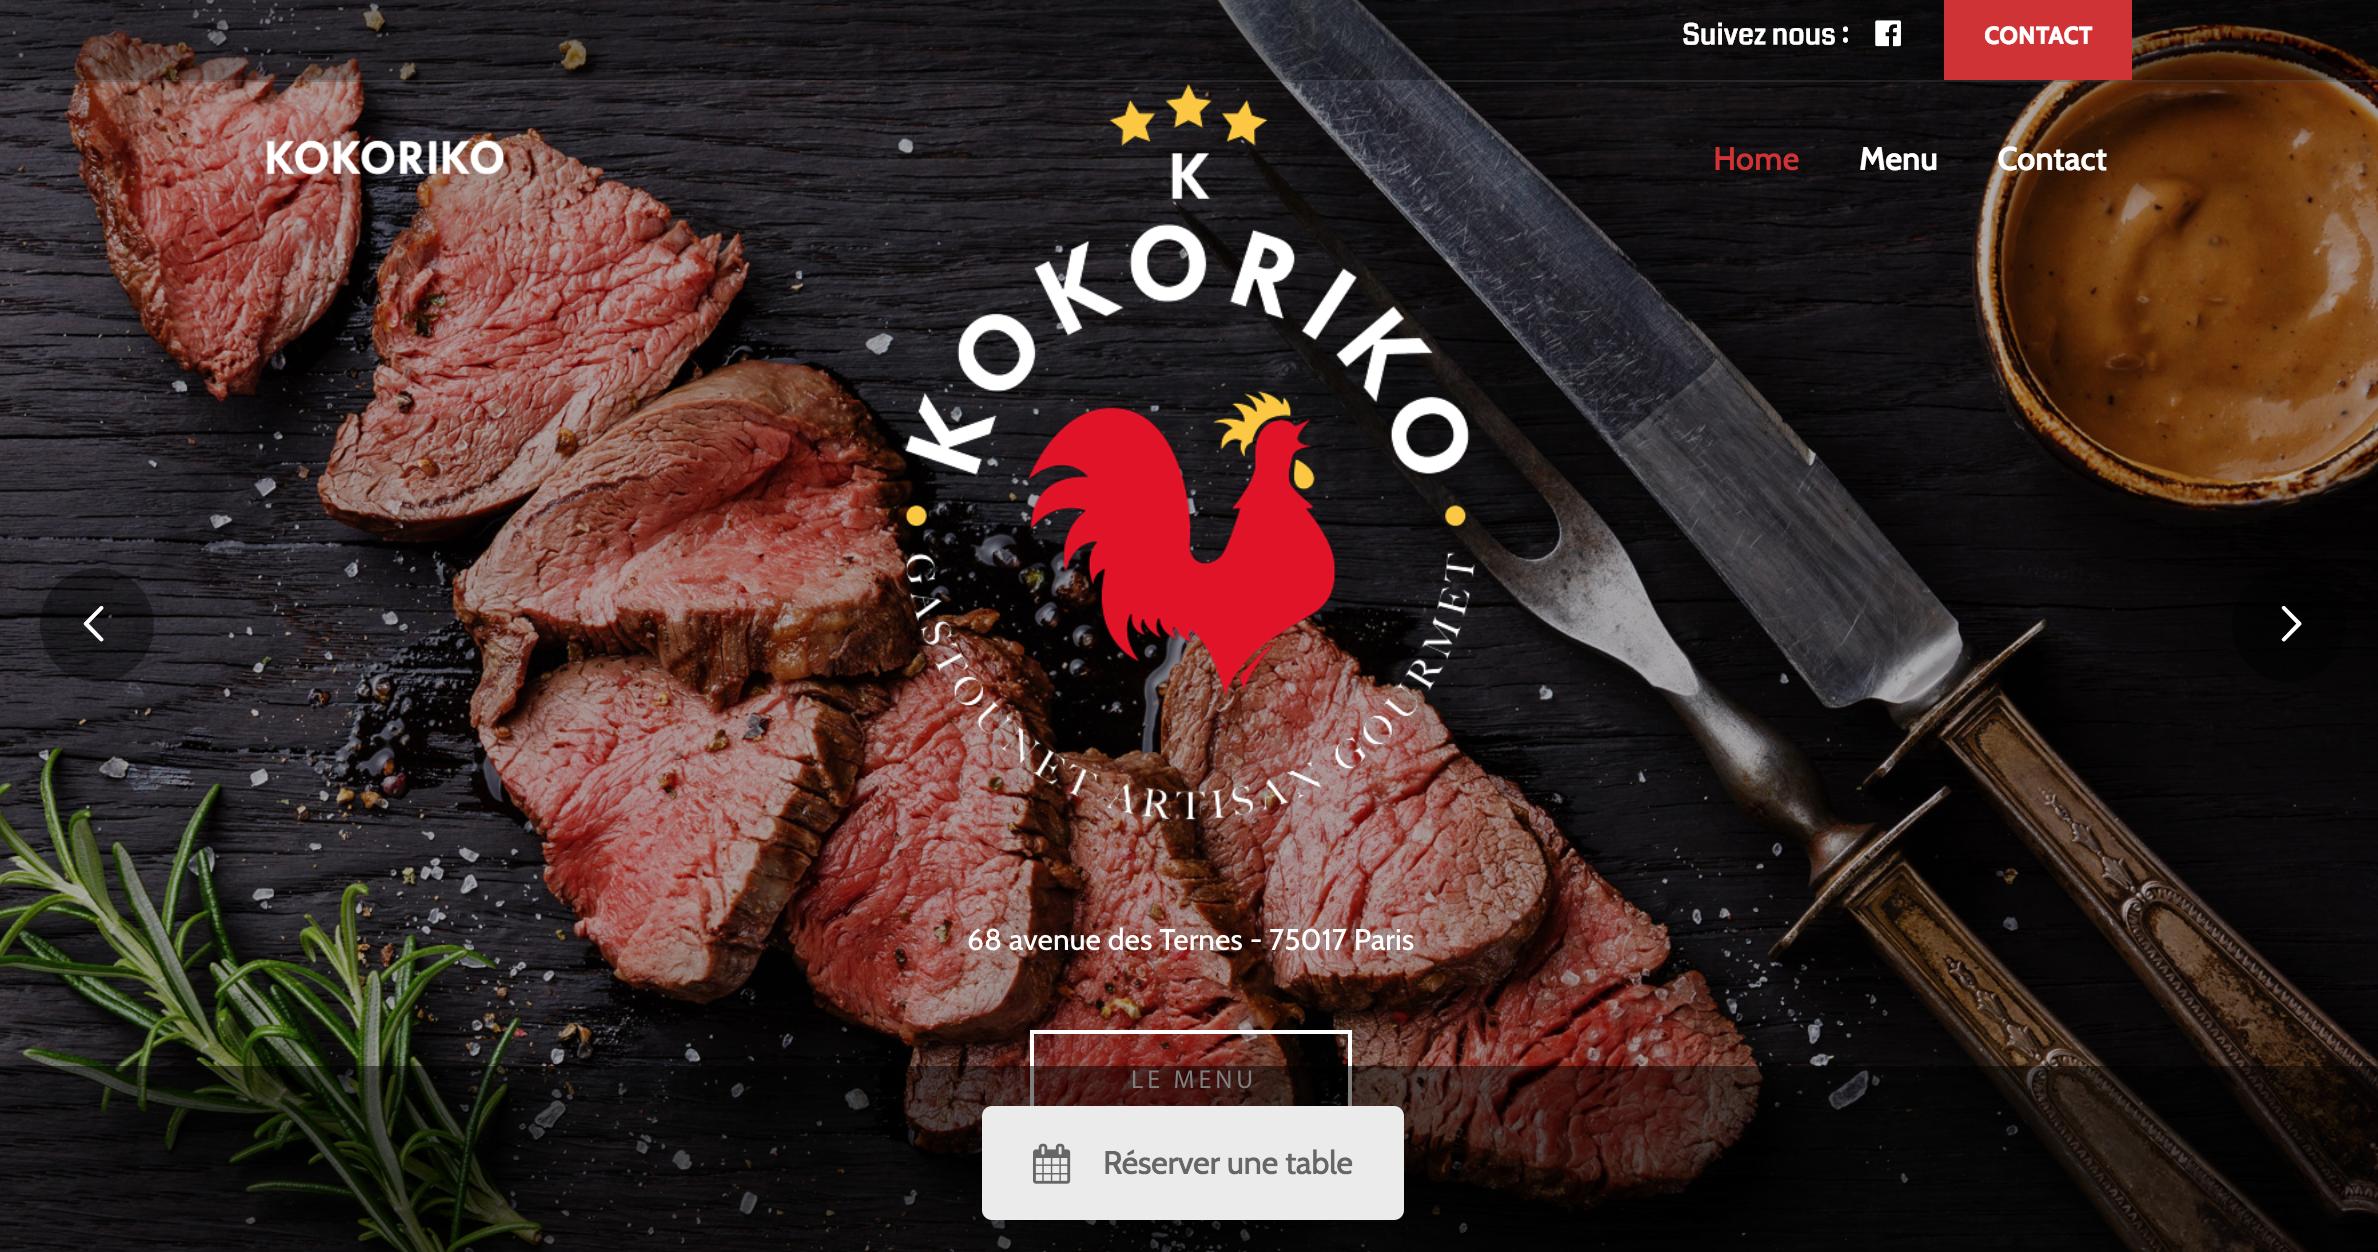 Nouveau site du restaurant bassari Kokoriko à Paris